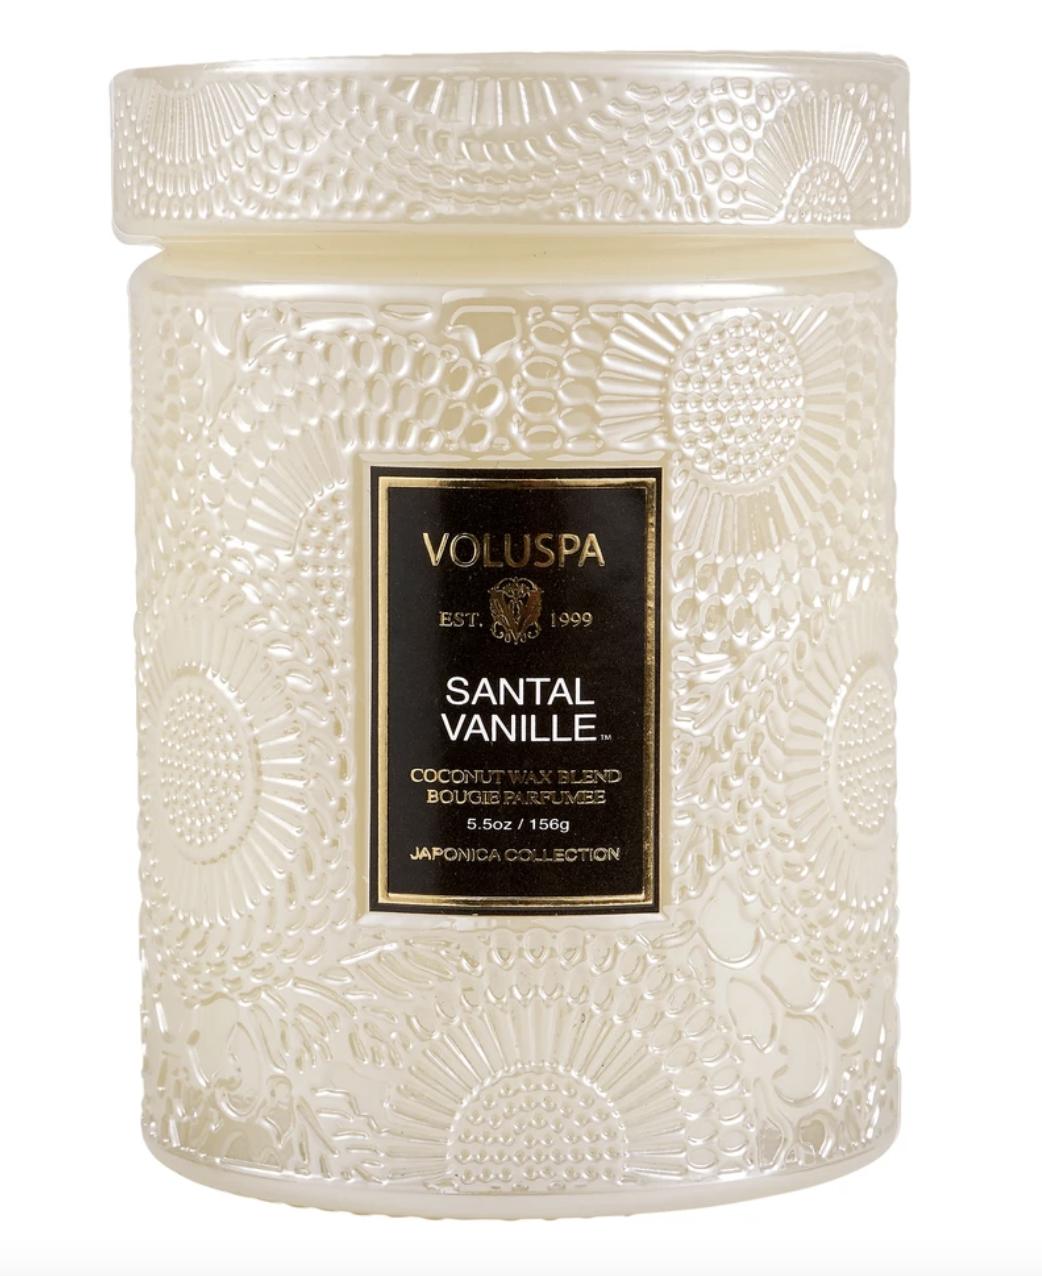 Voluspa Santal Vanille, Embossed Glass Jar with Lid